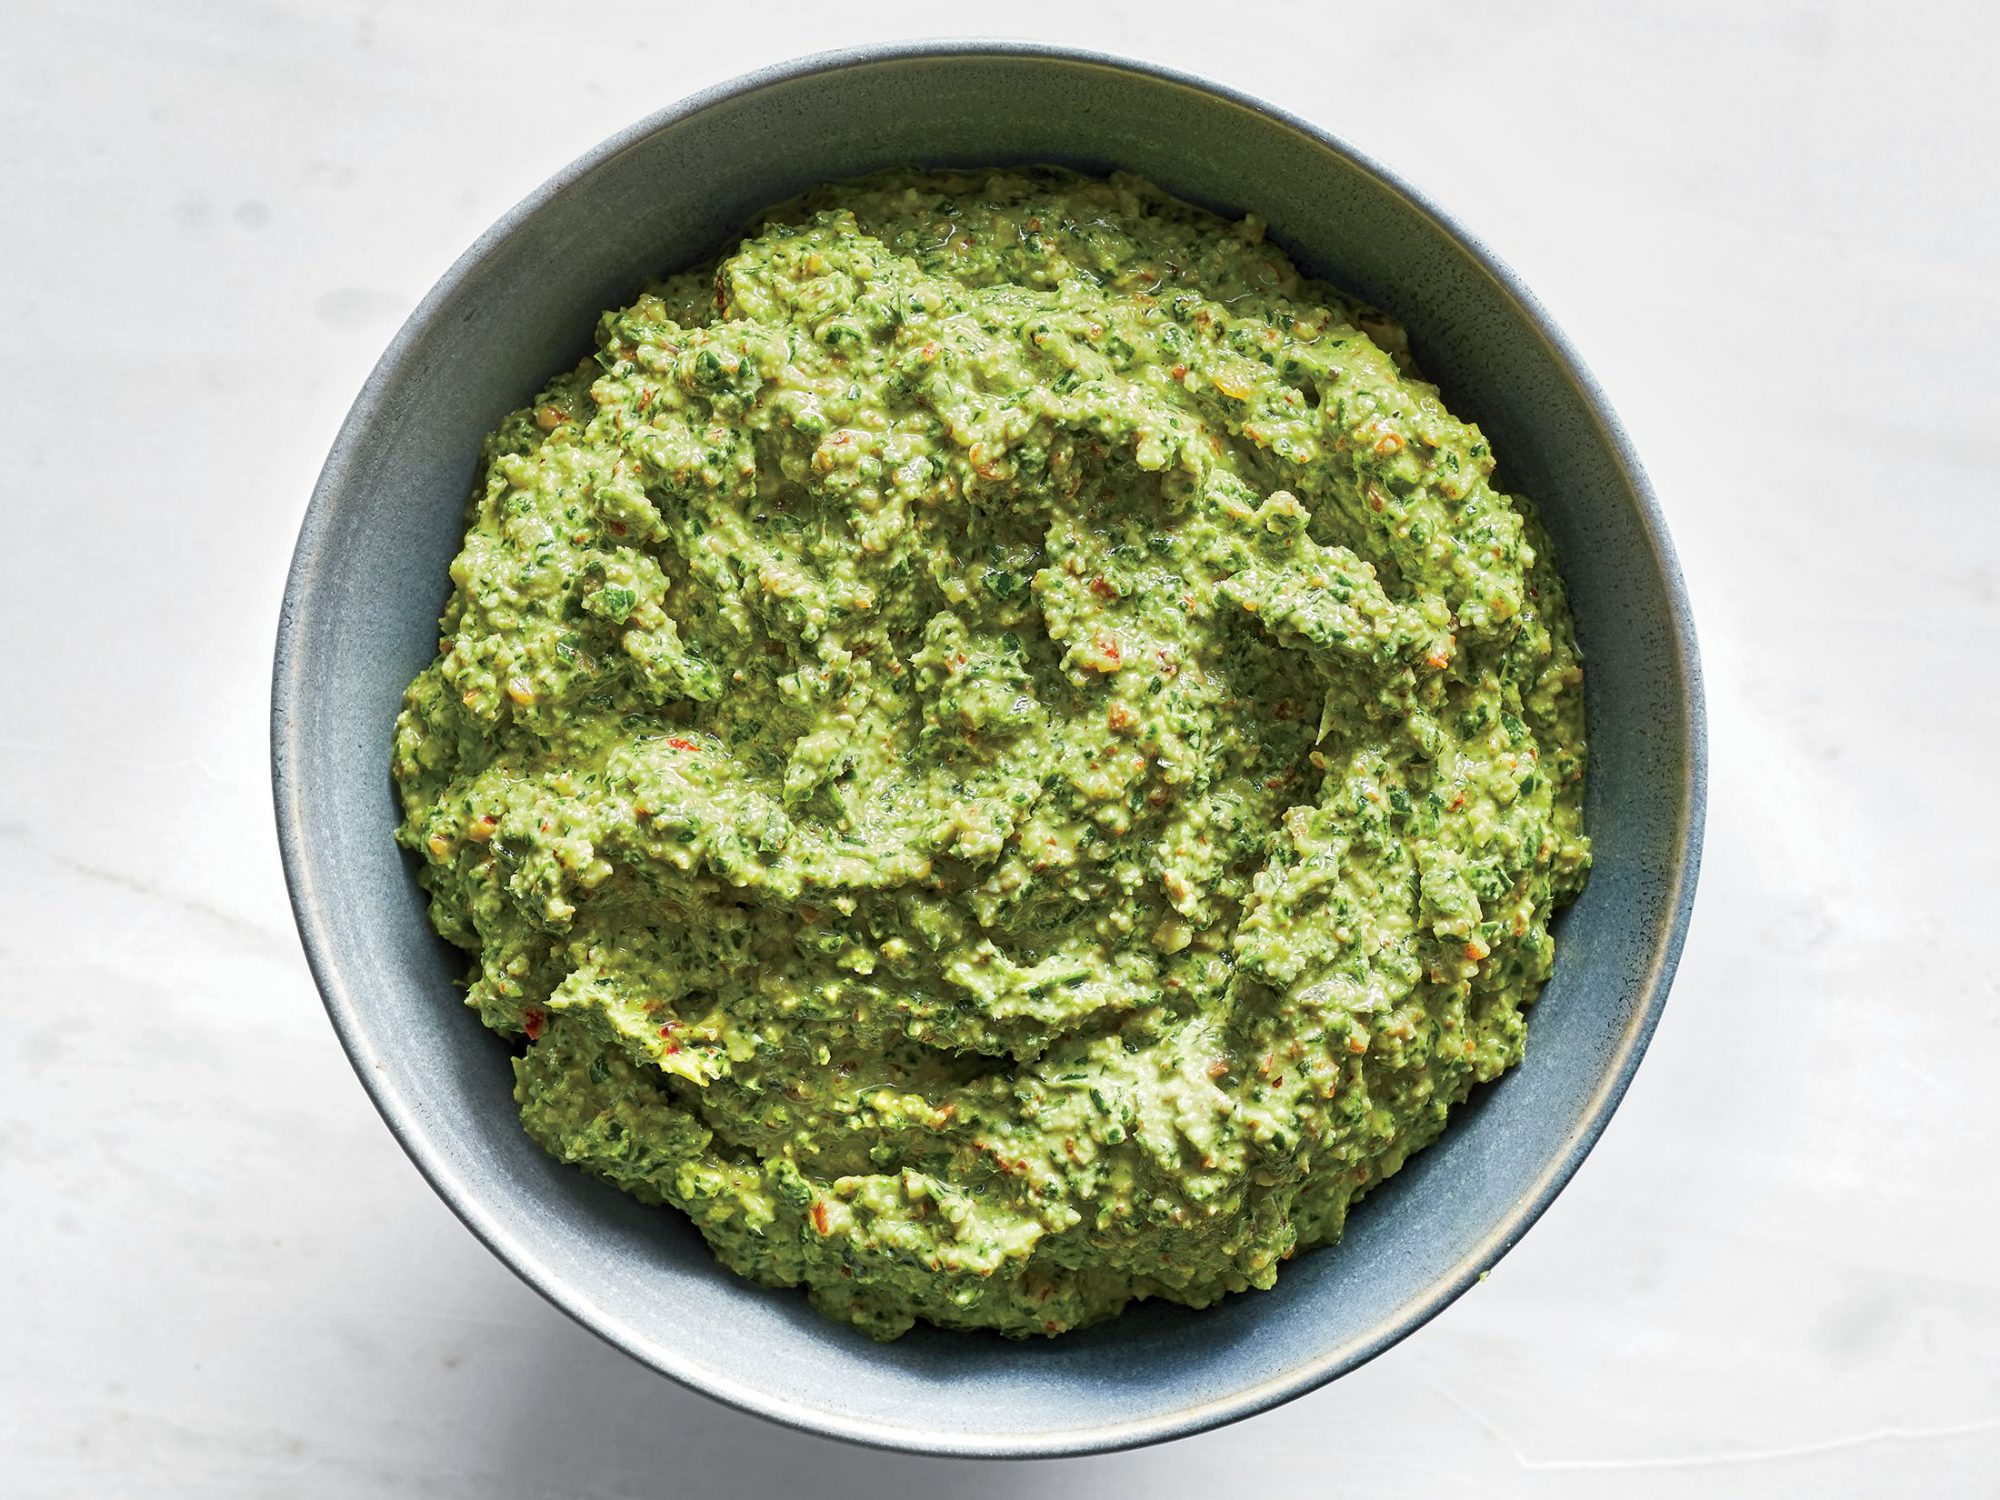 Toasted Pecan and Kale Pesto